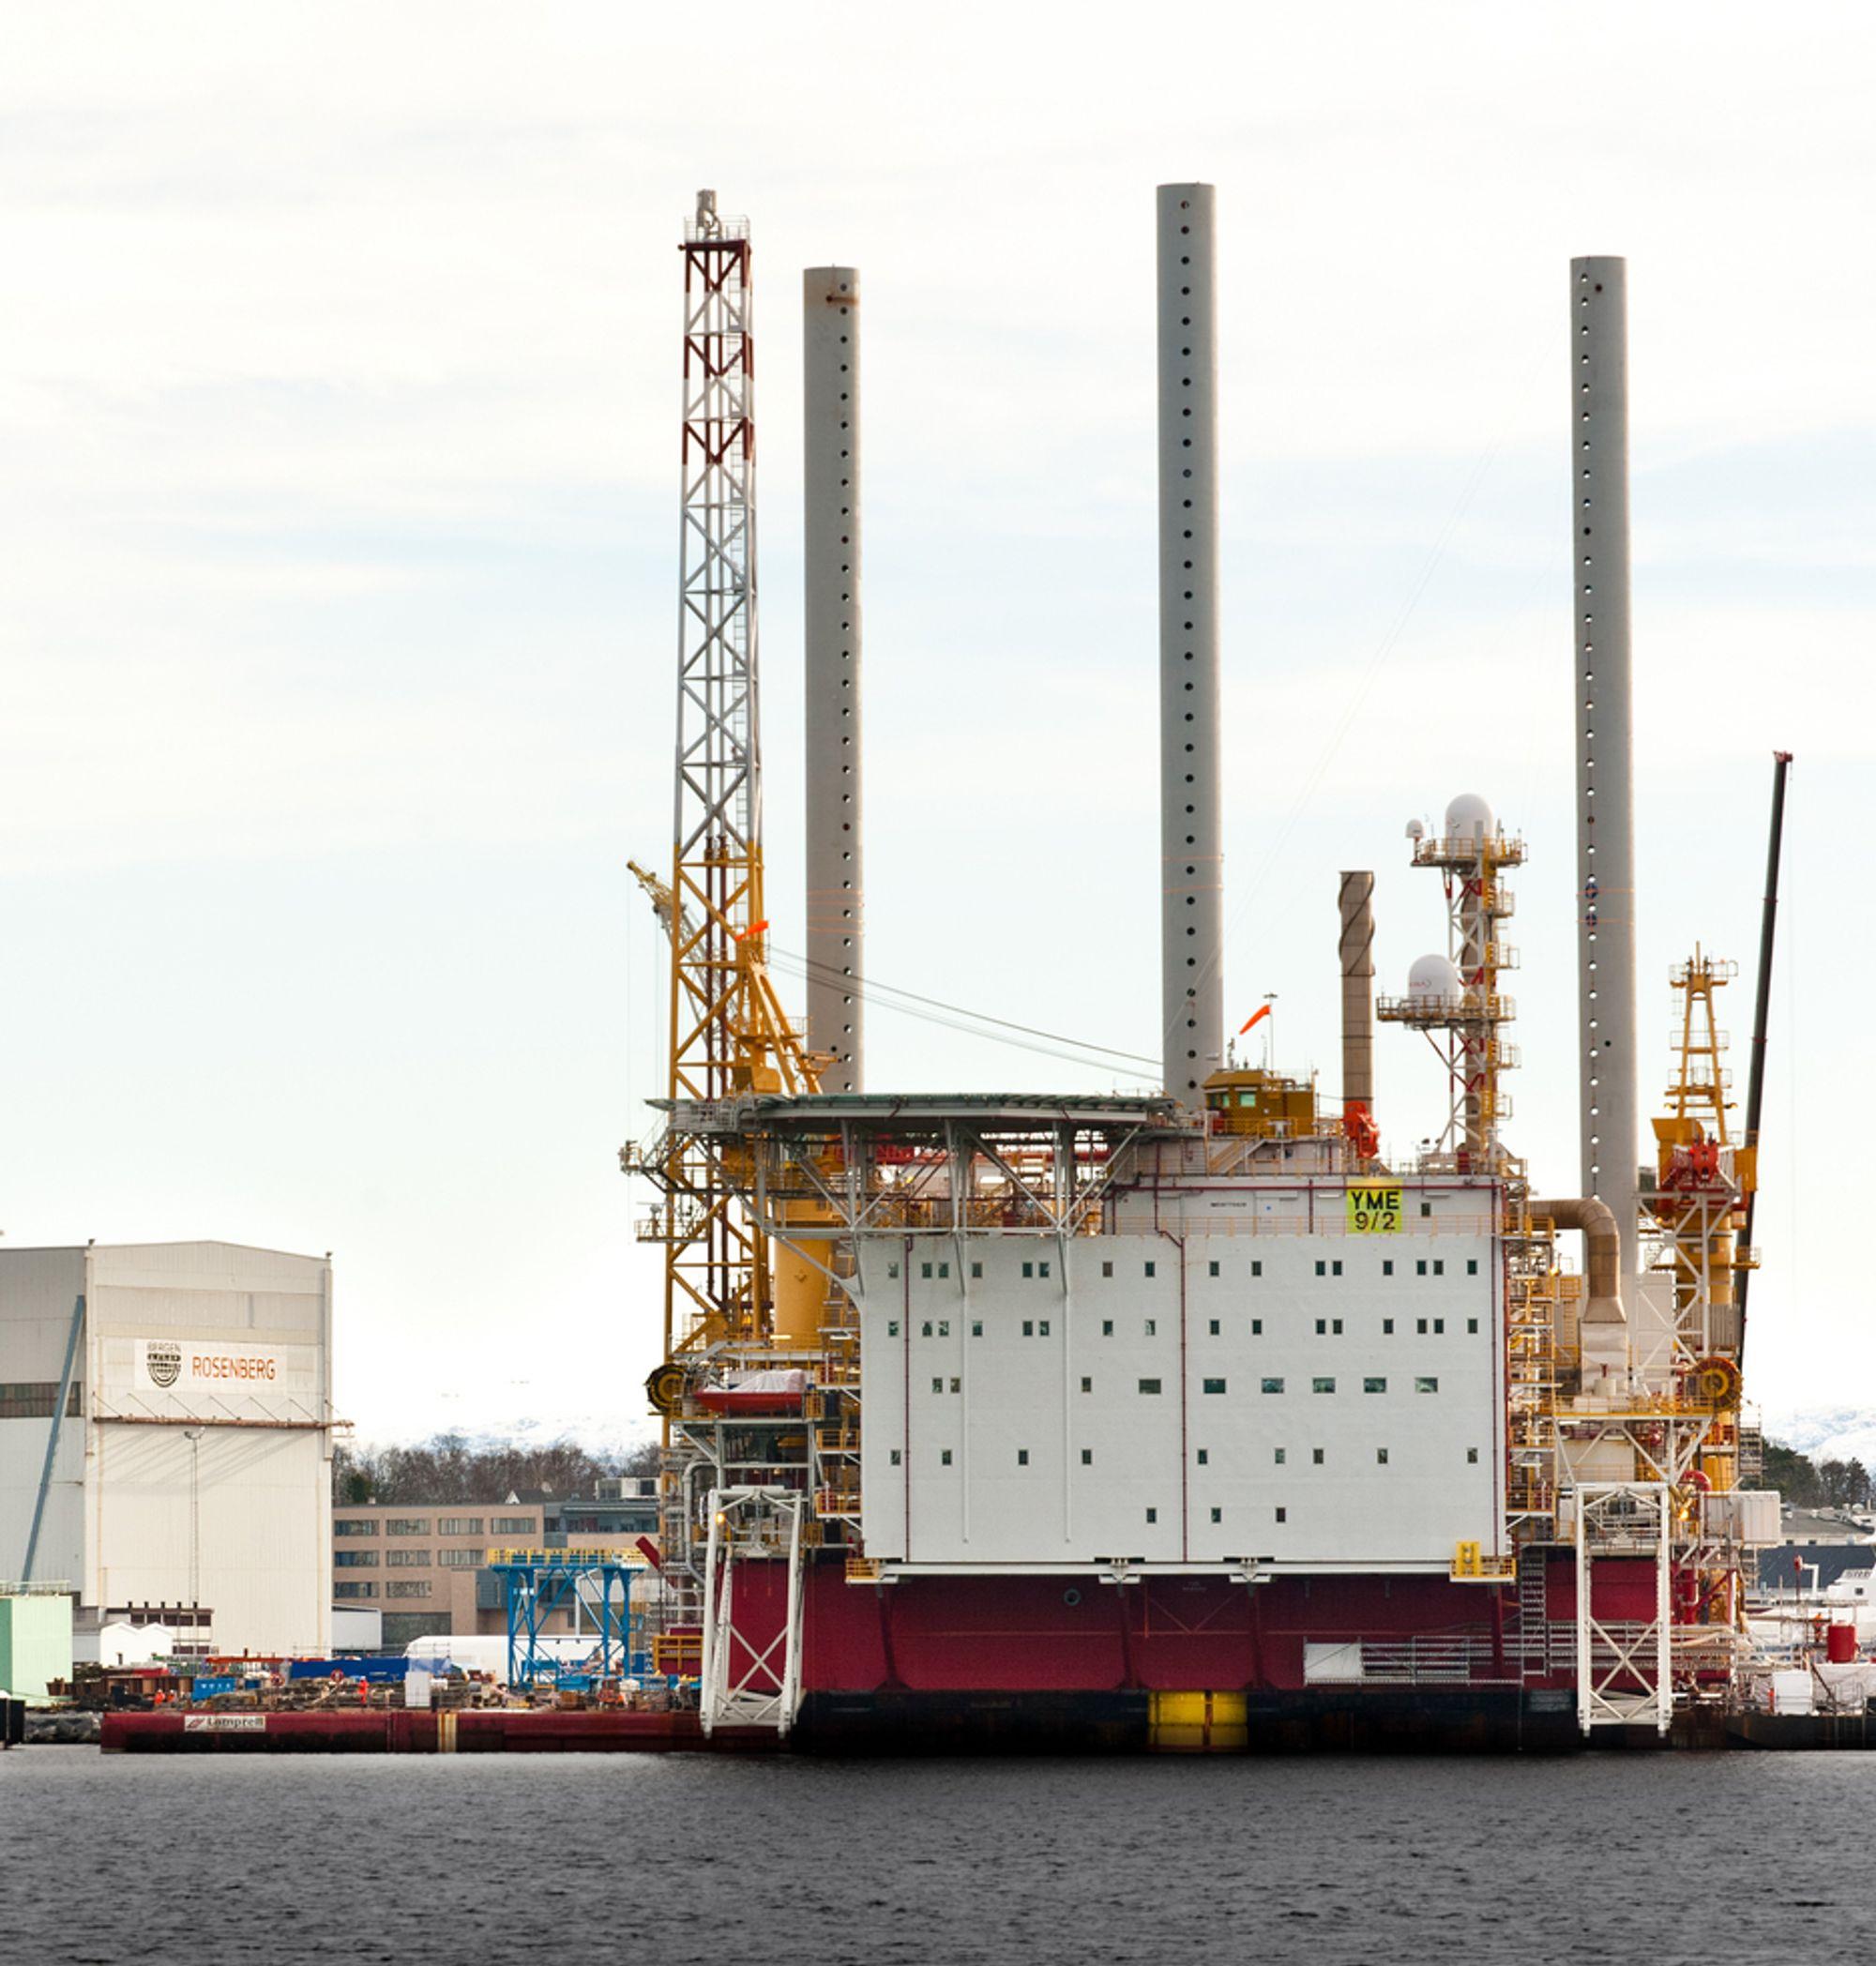 Det er store problemer med Yme-plattformen i Nordsjøen.